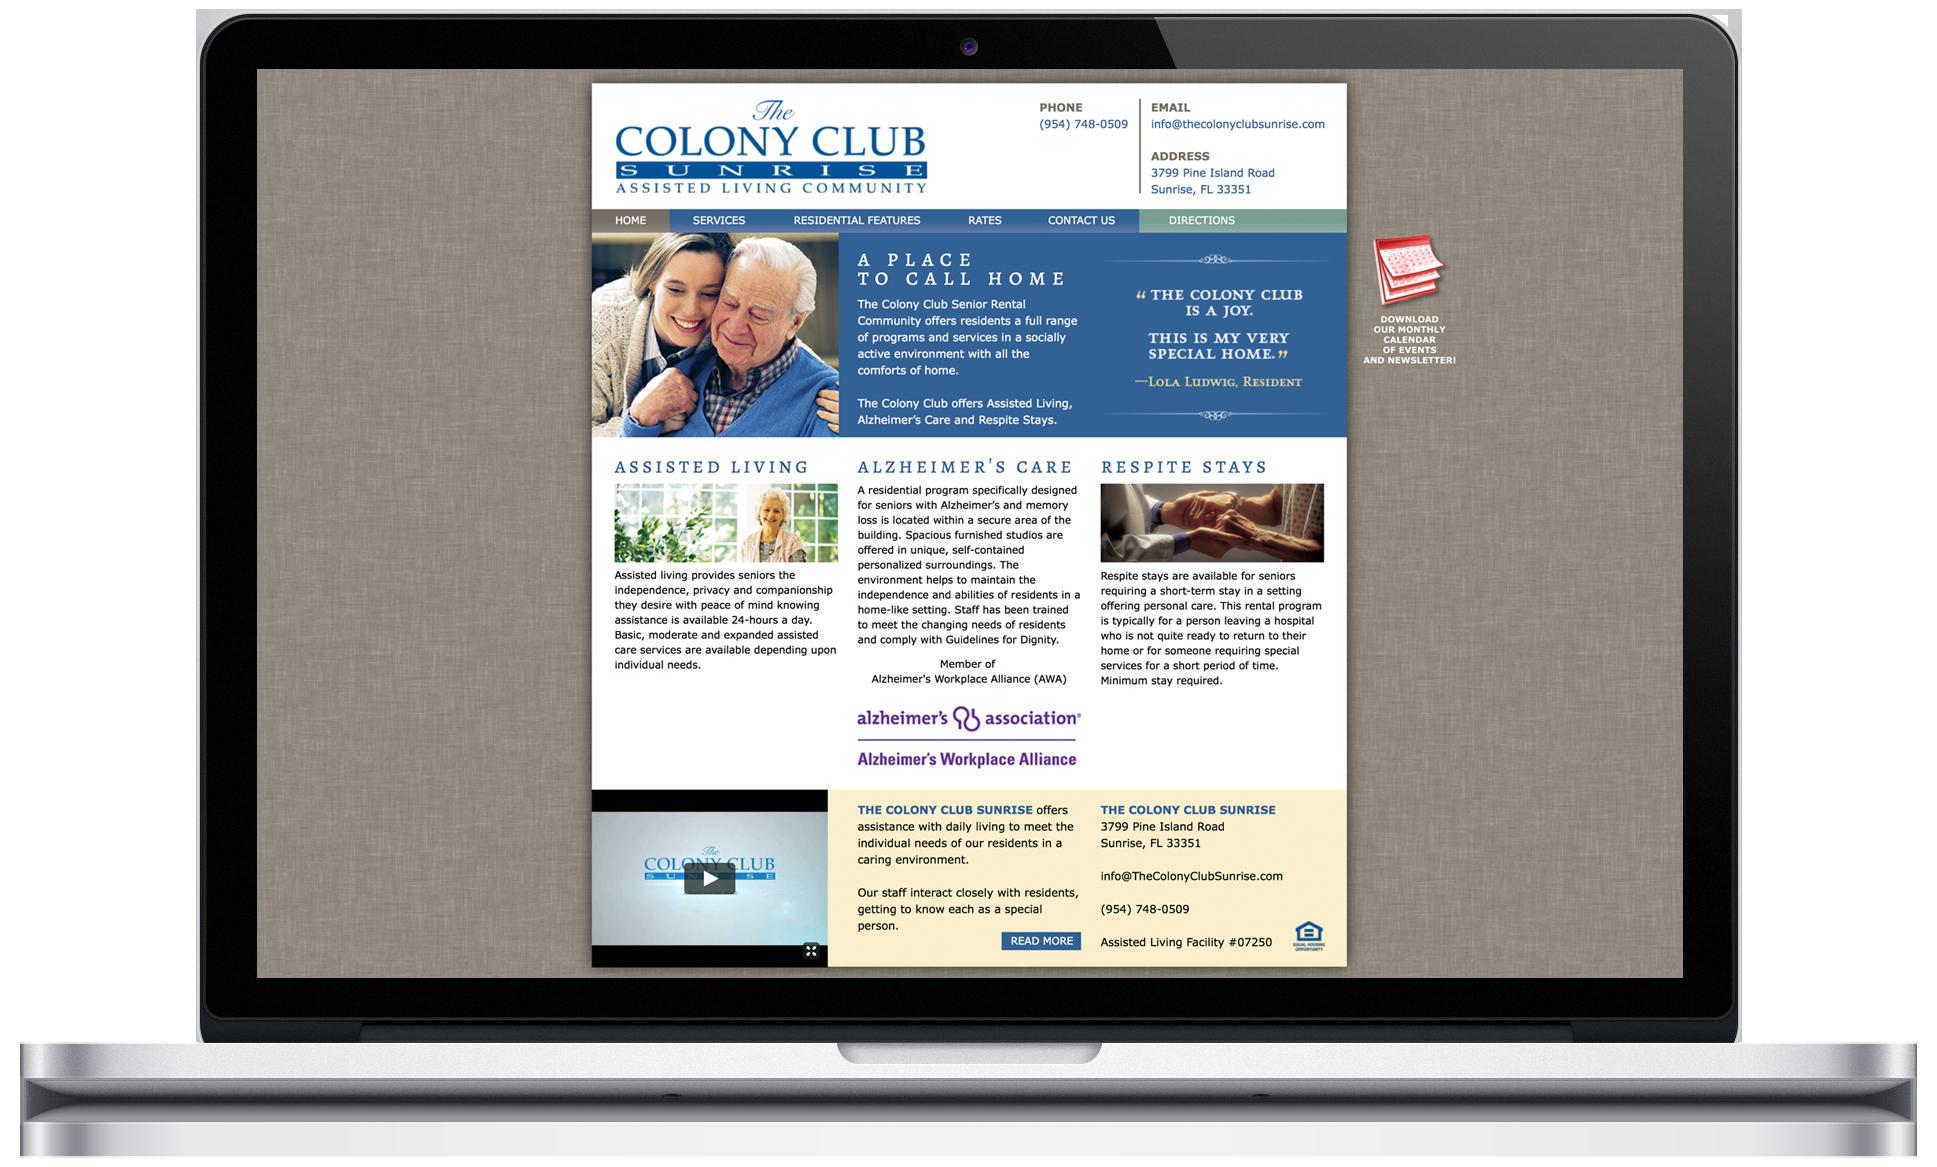 The Colony Club